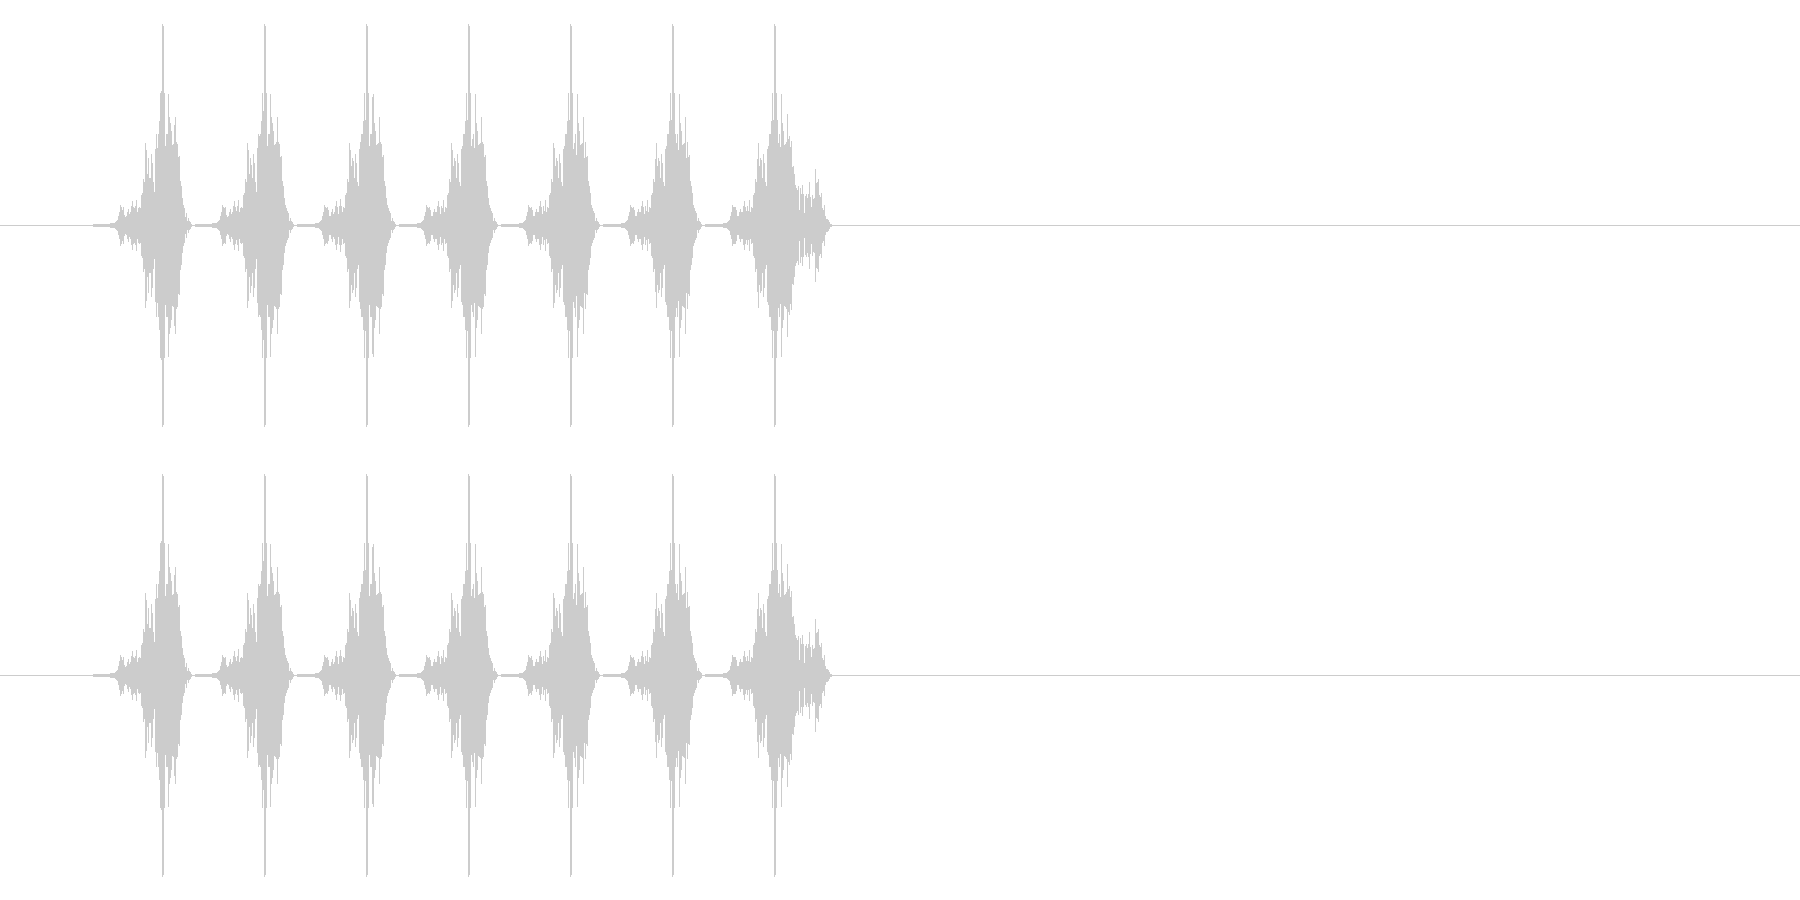 SNES-アクション01-17(メッセーの未再生の波形